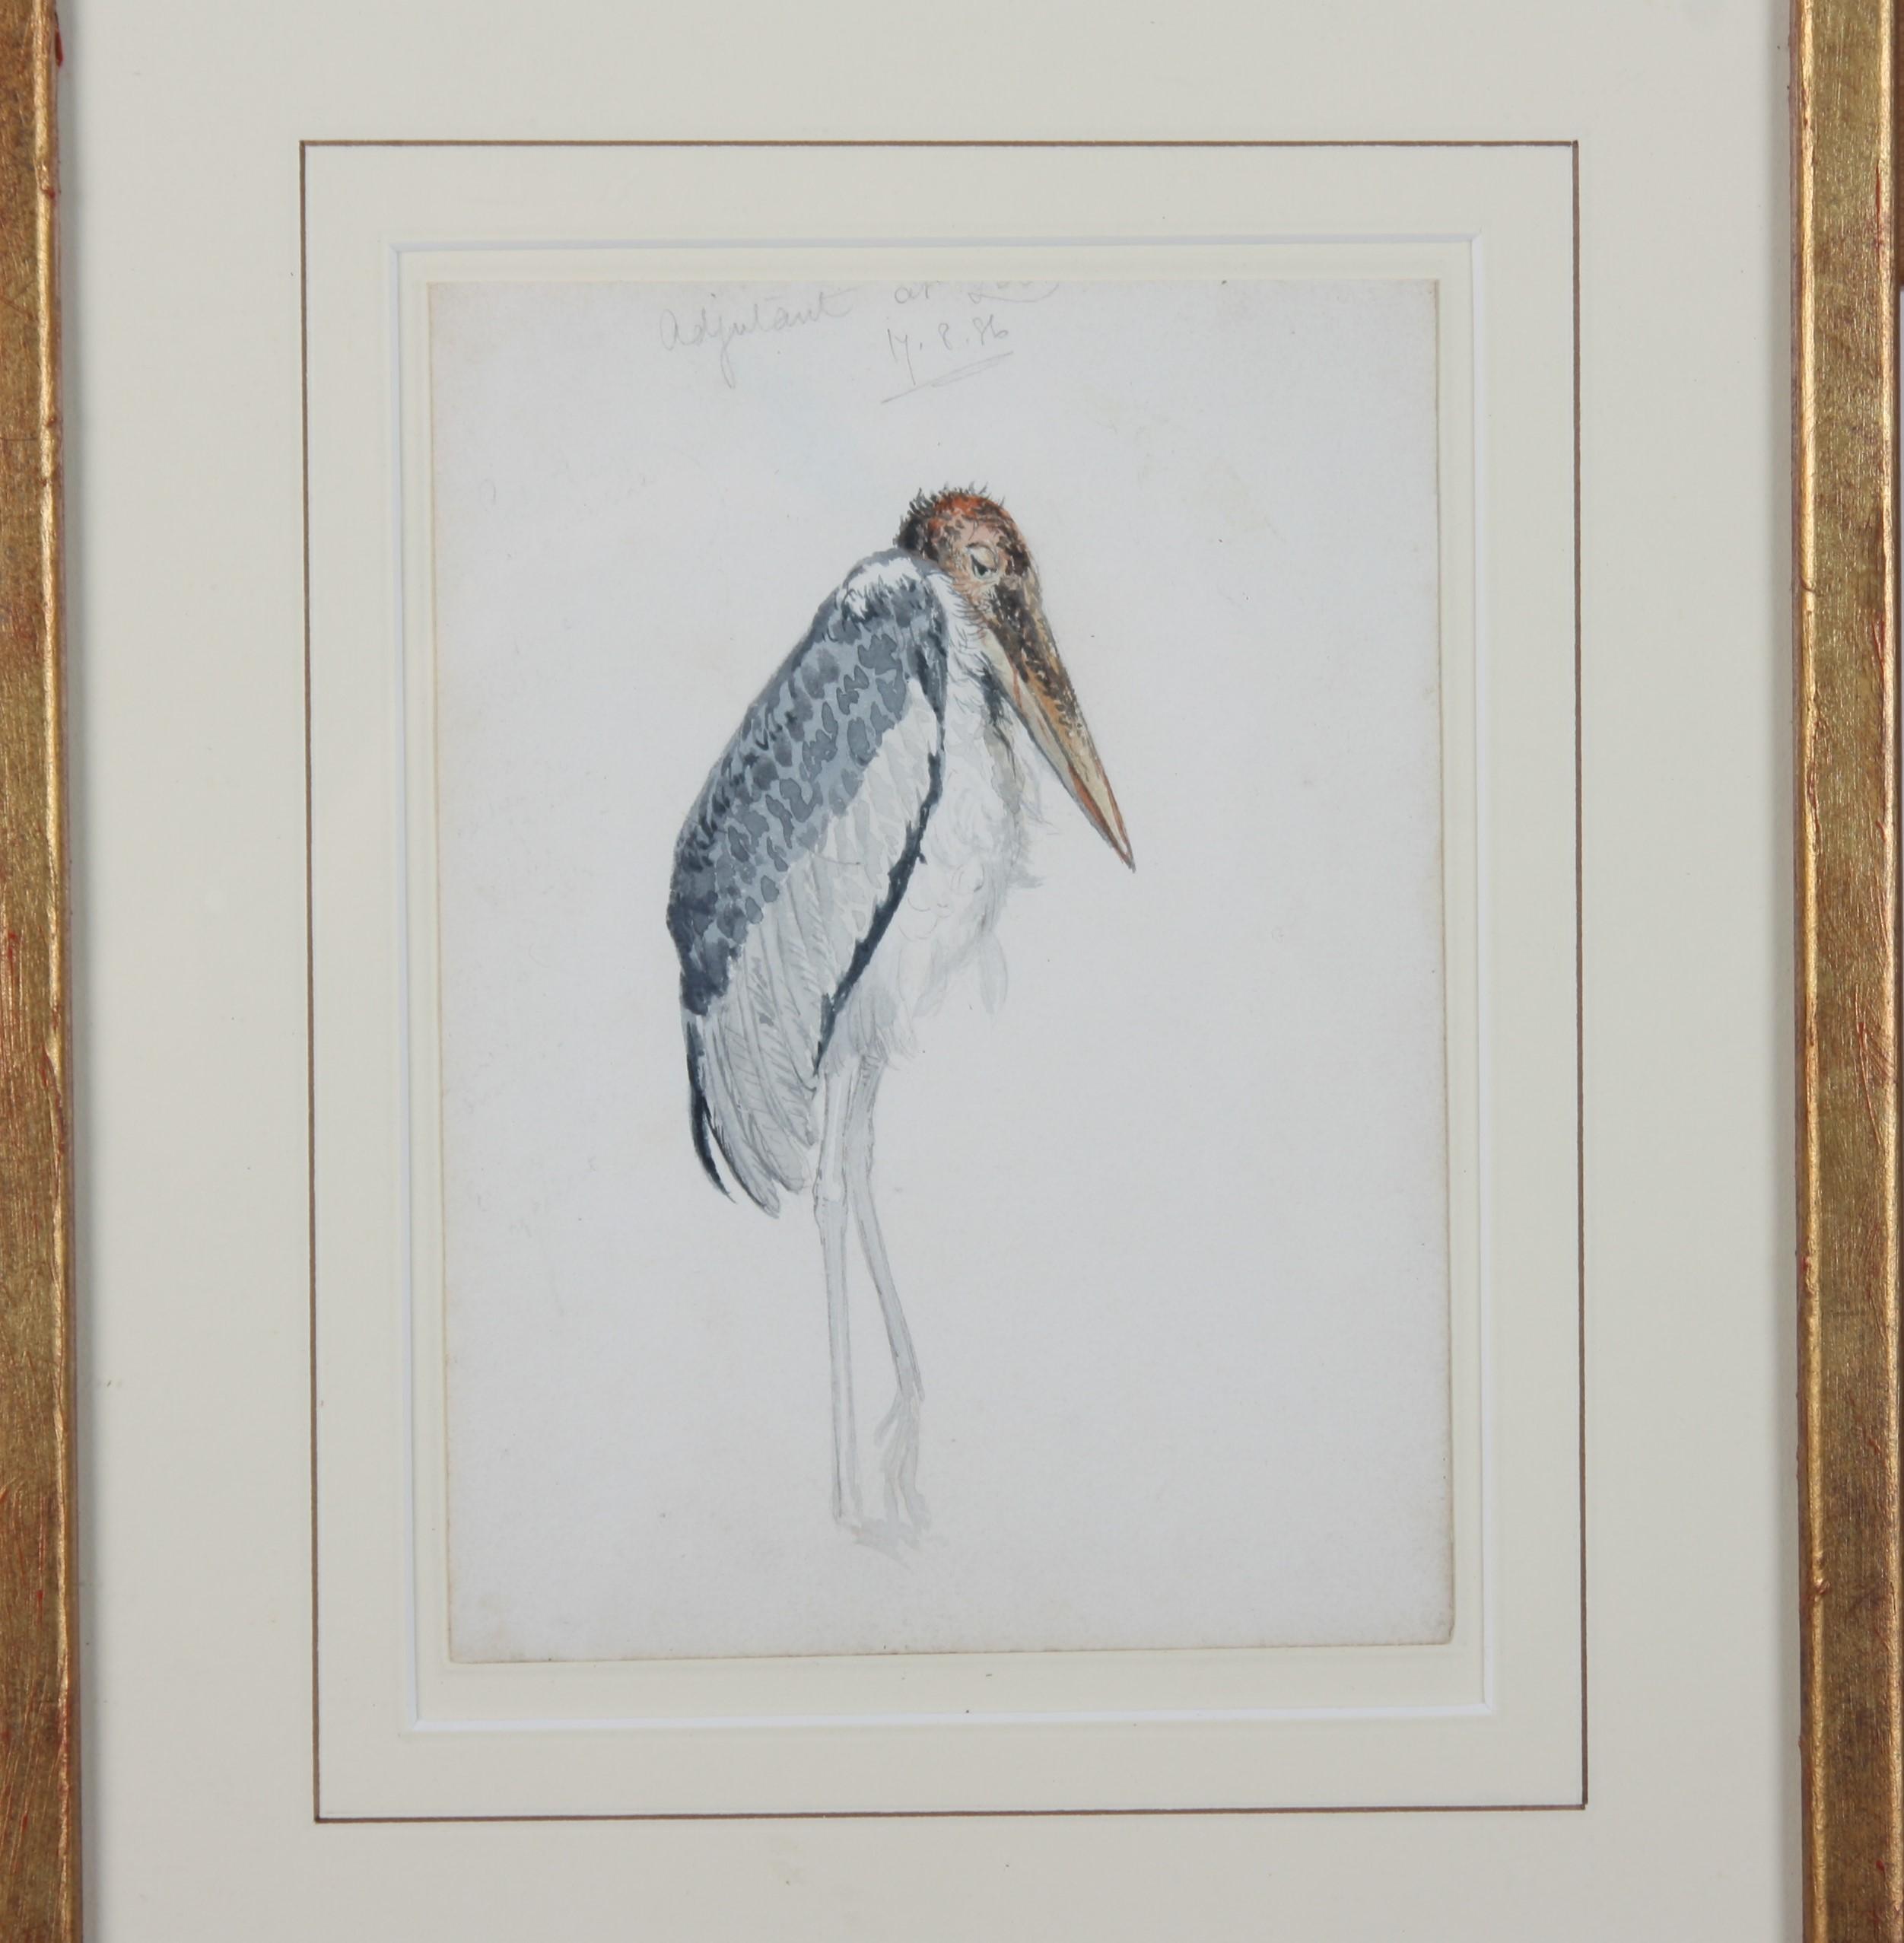 Lot 98 - Edward LEAR (1812-1888) Adjutant Bird Watercolour Partial signature Inscription and date 17.8.